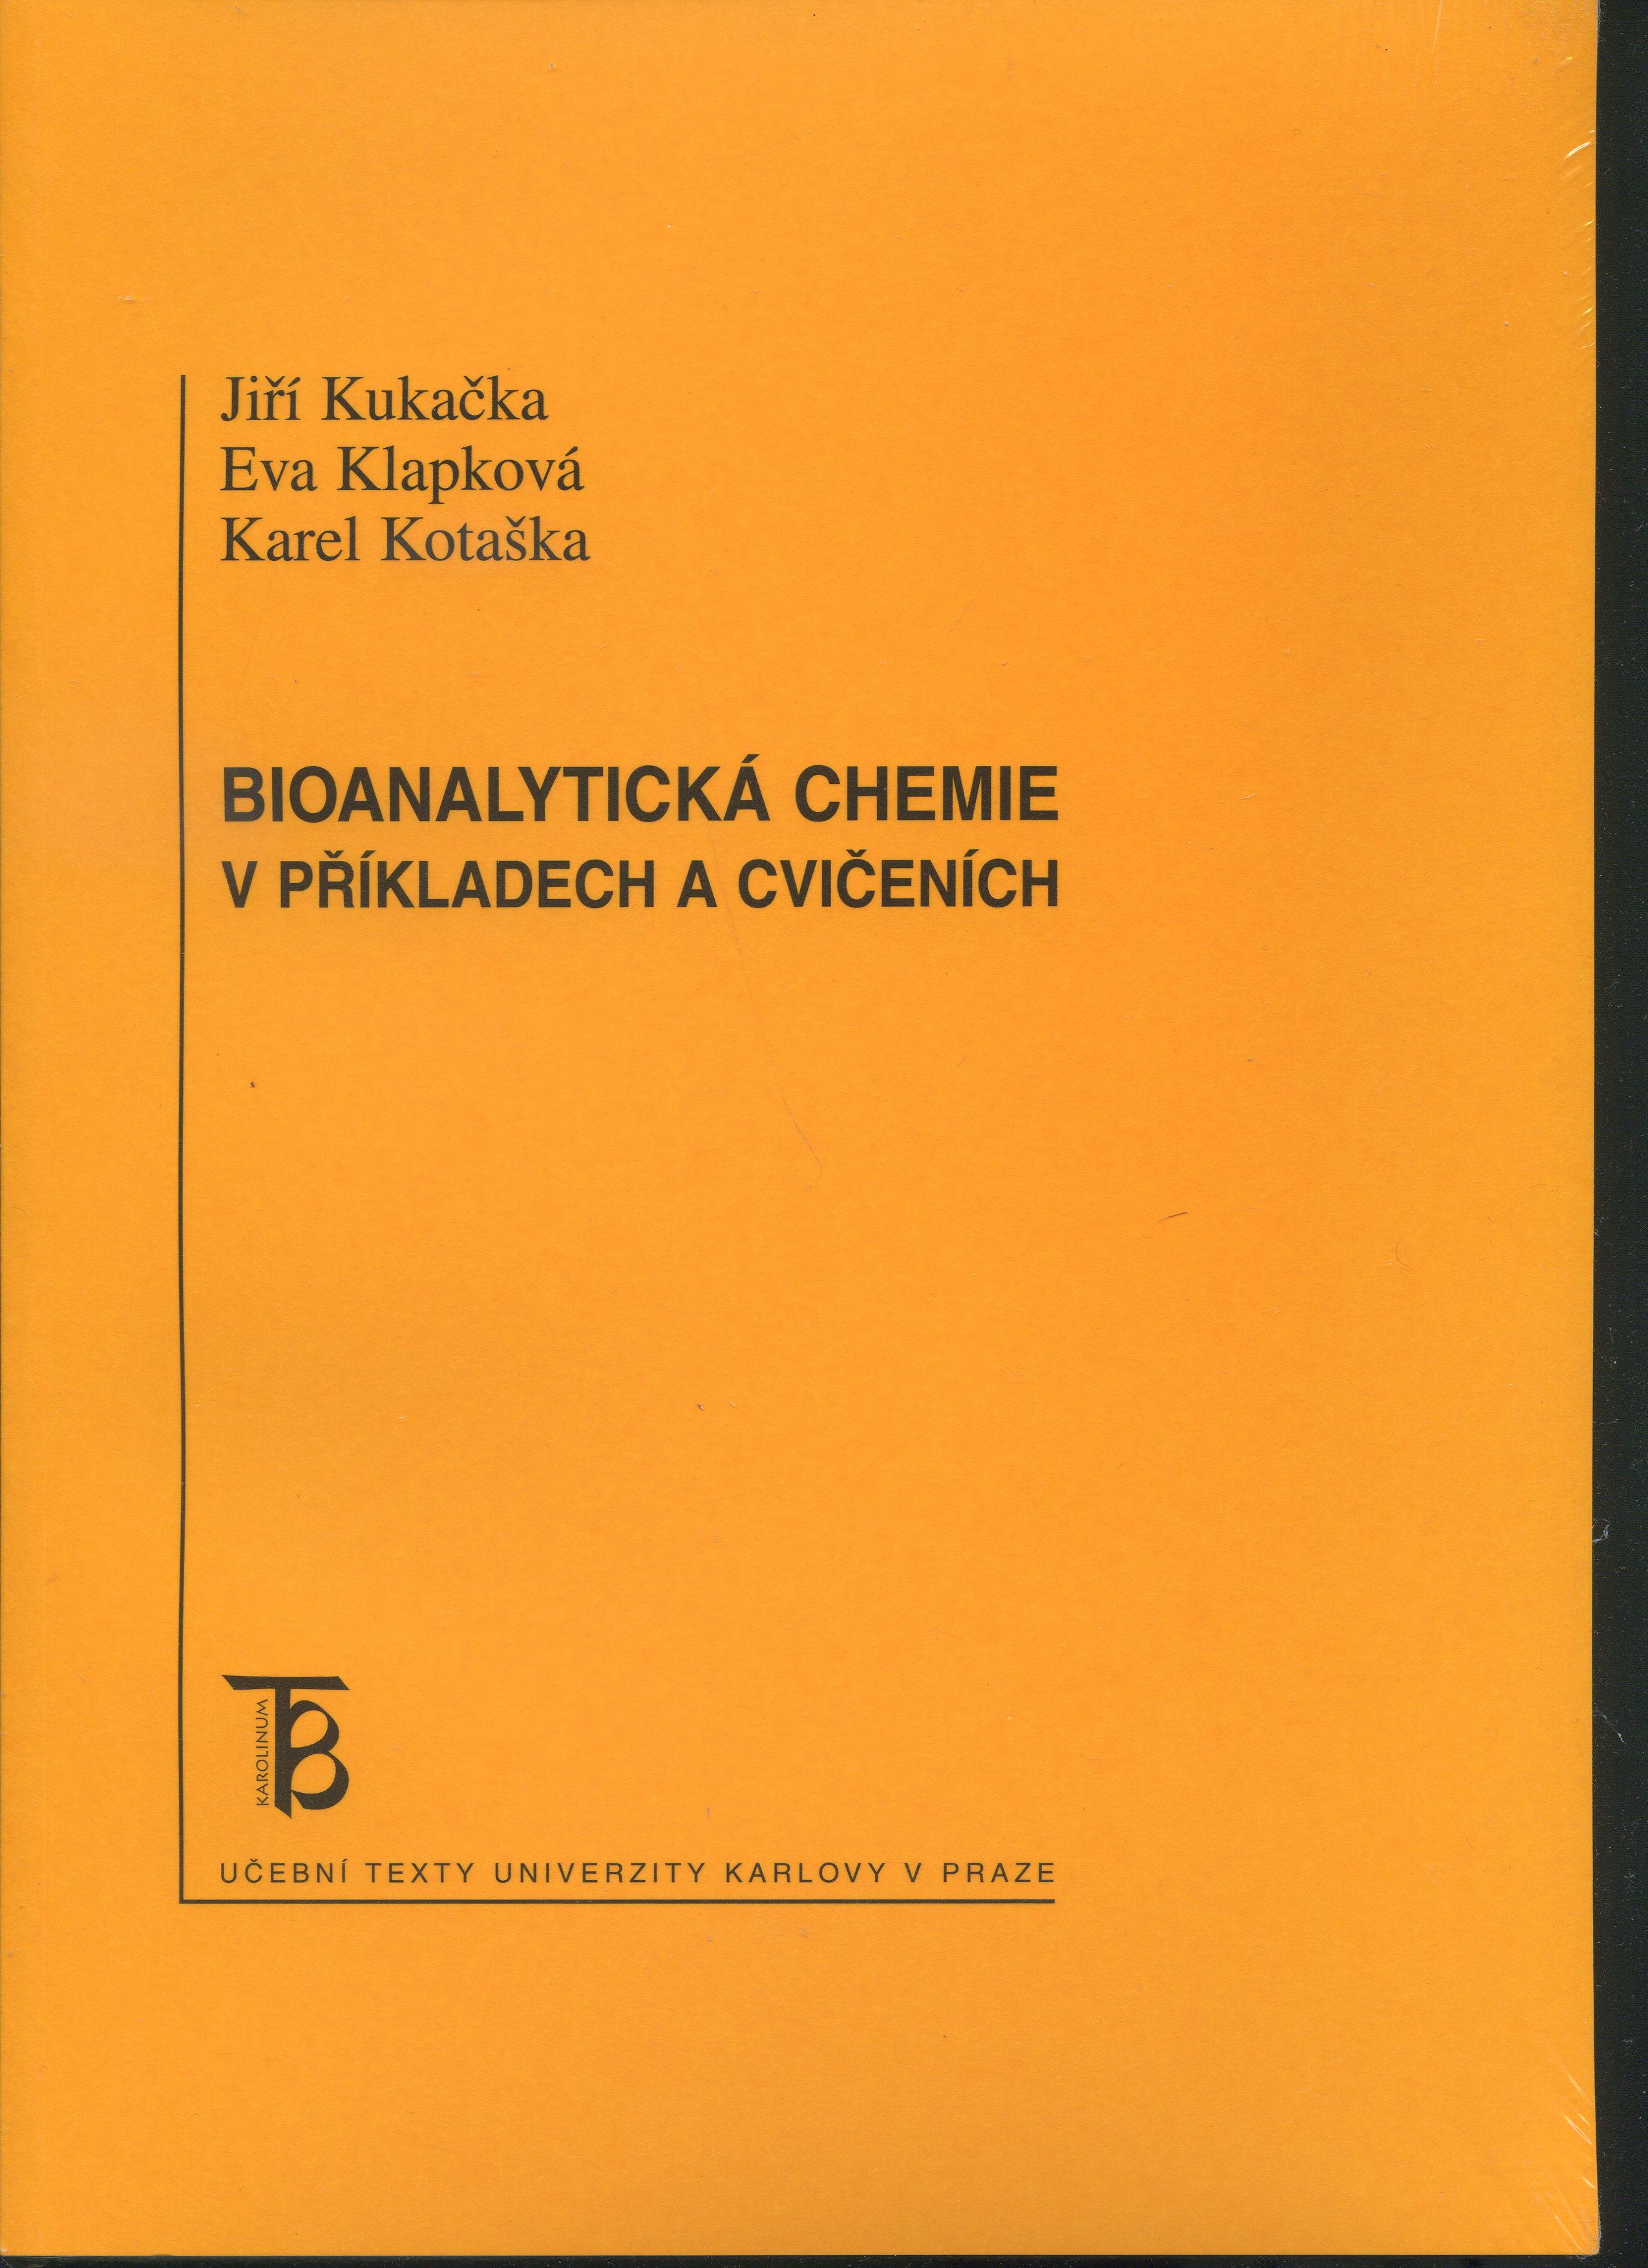 Bioanalytická chemie